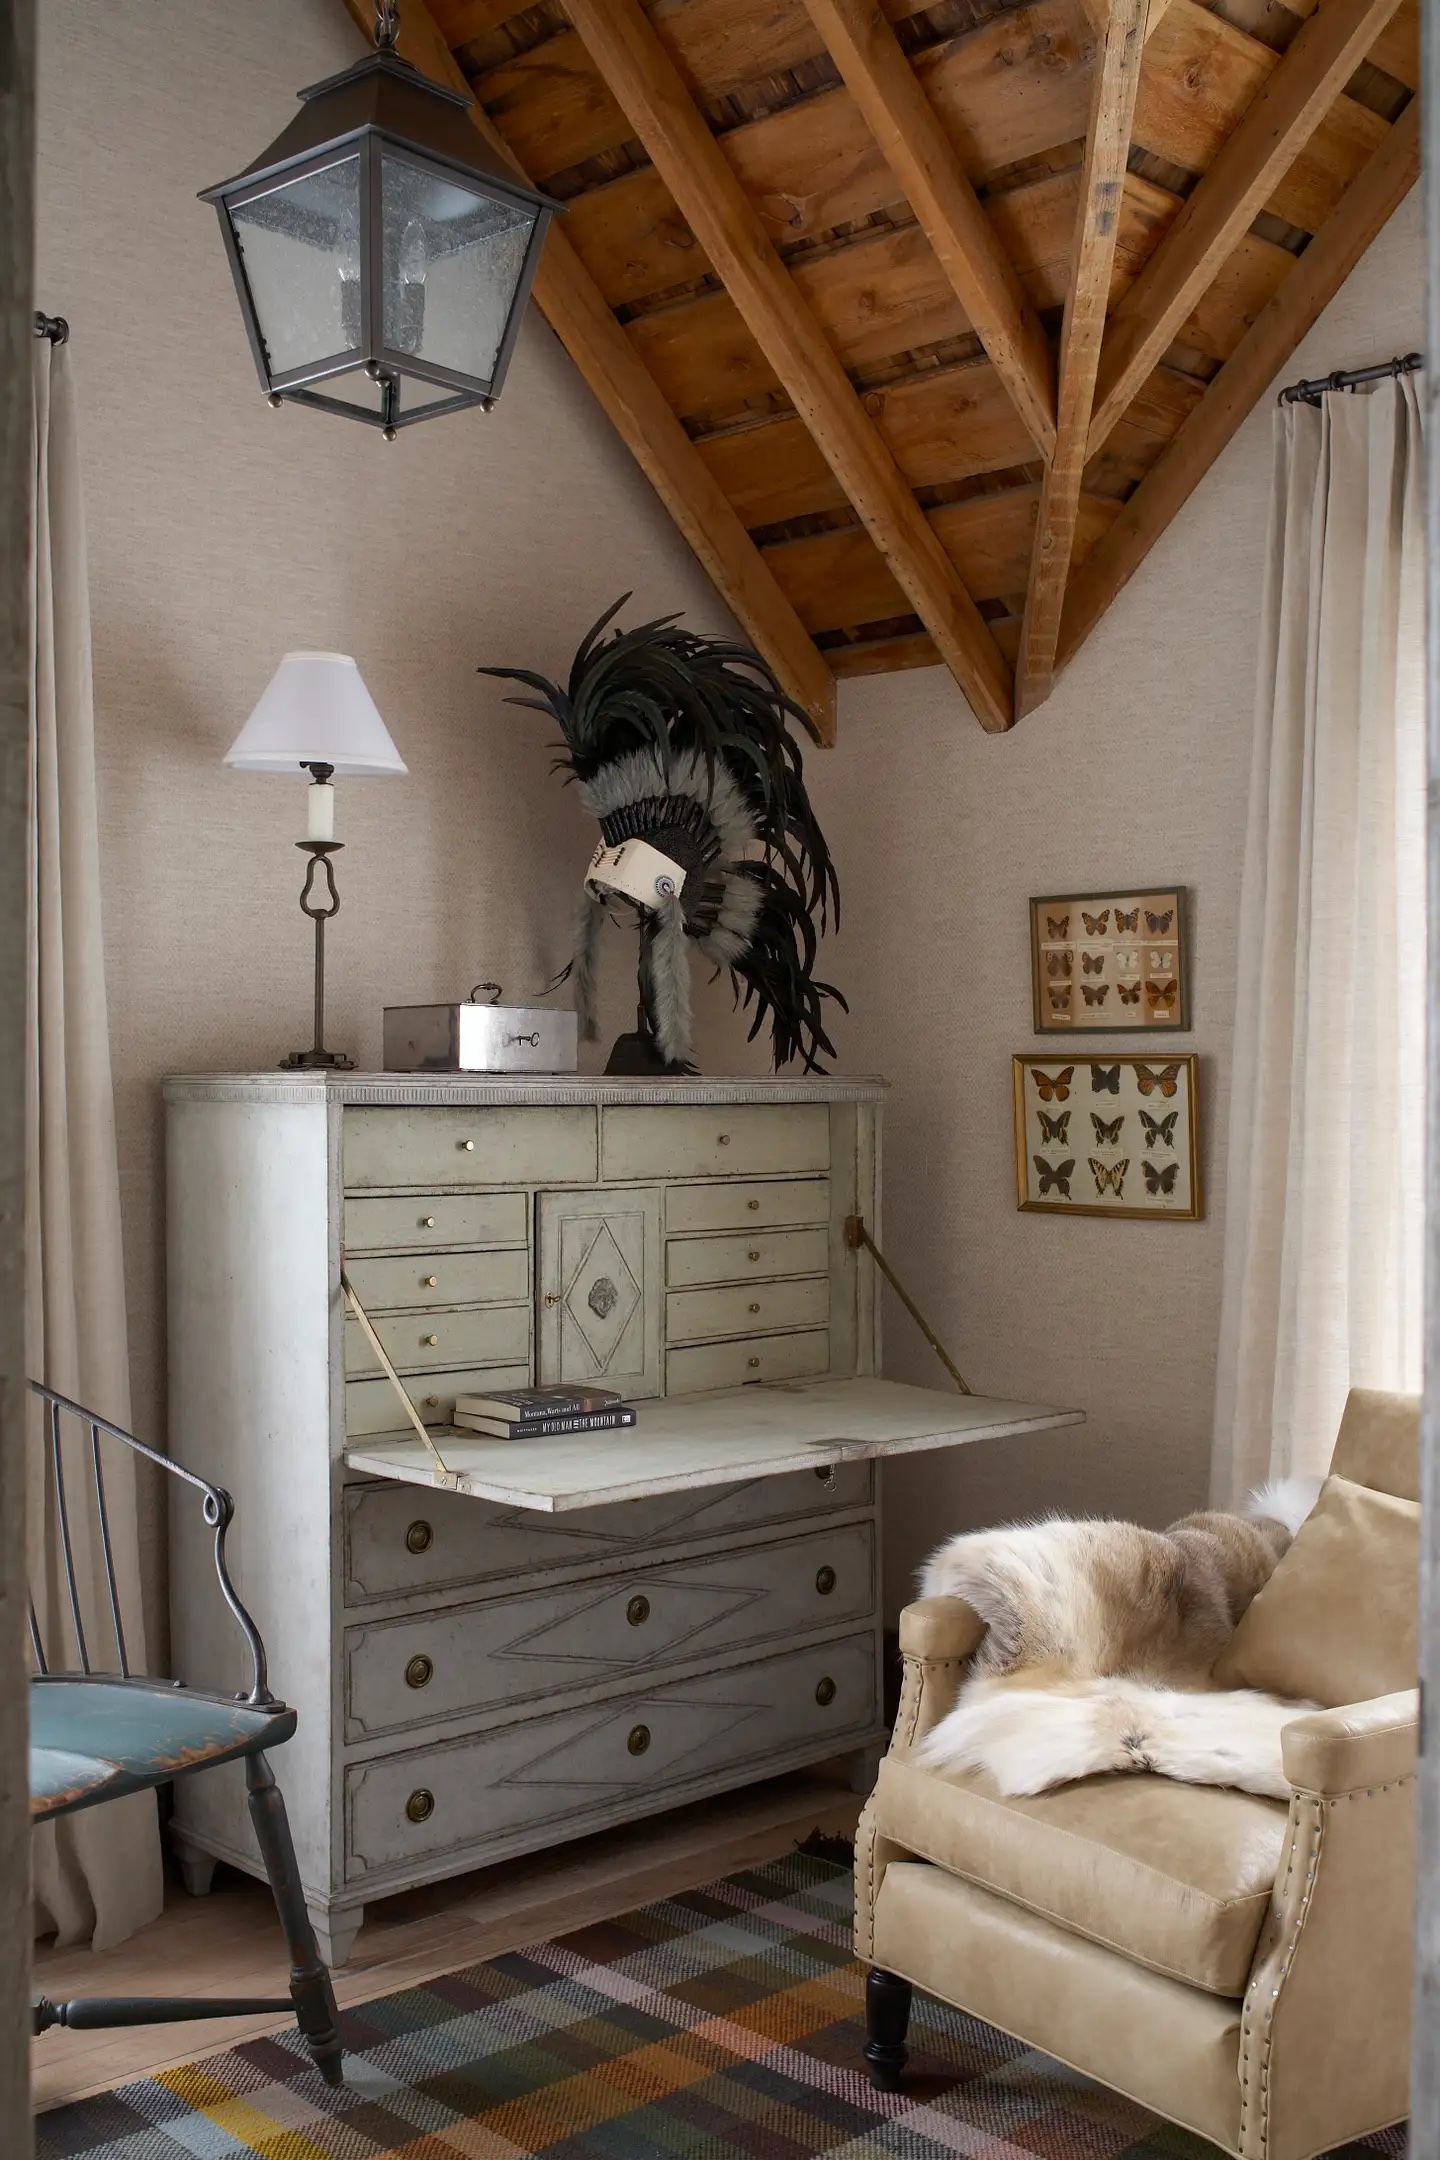 Koo de Kir tucked an antique Swedish secretary into the corner of this cozy study in Montana.